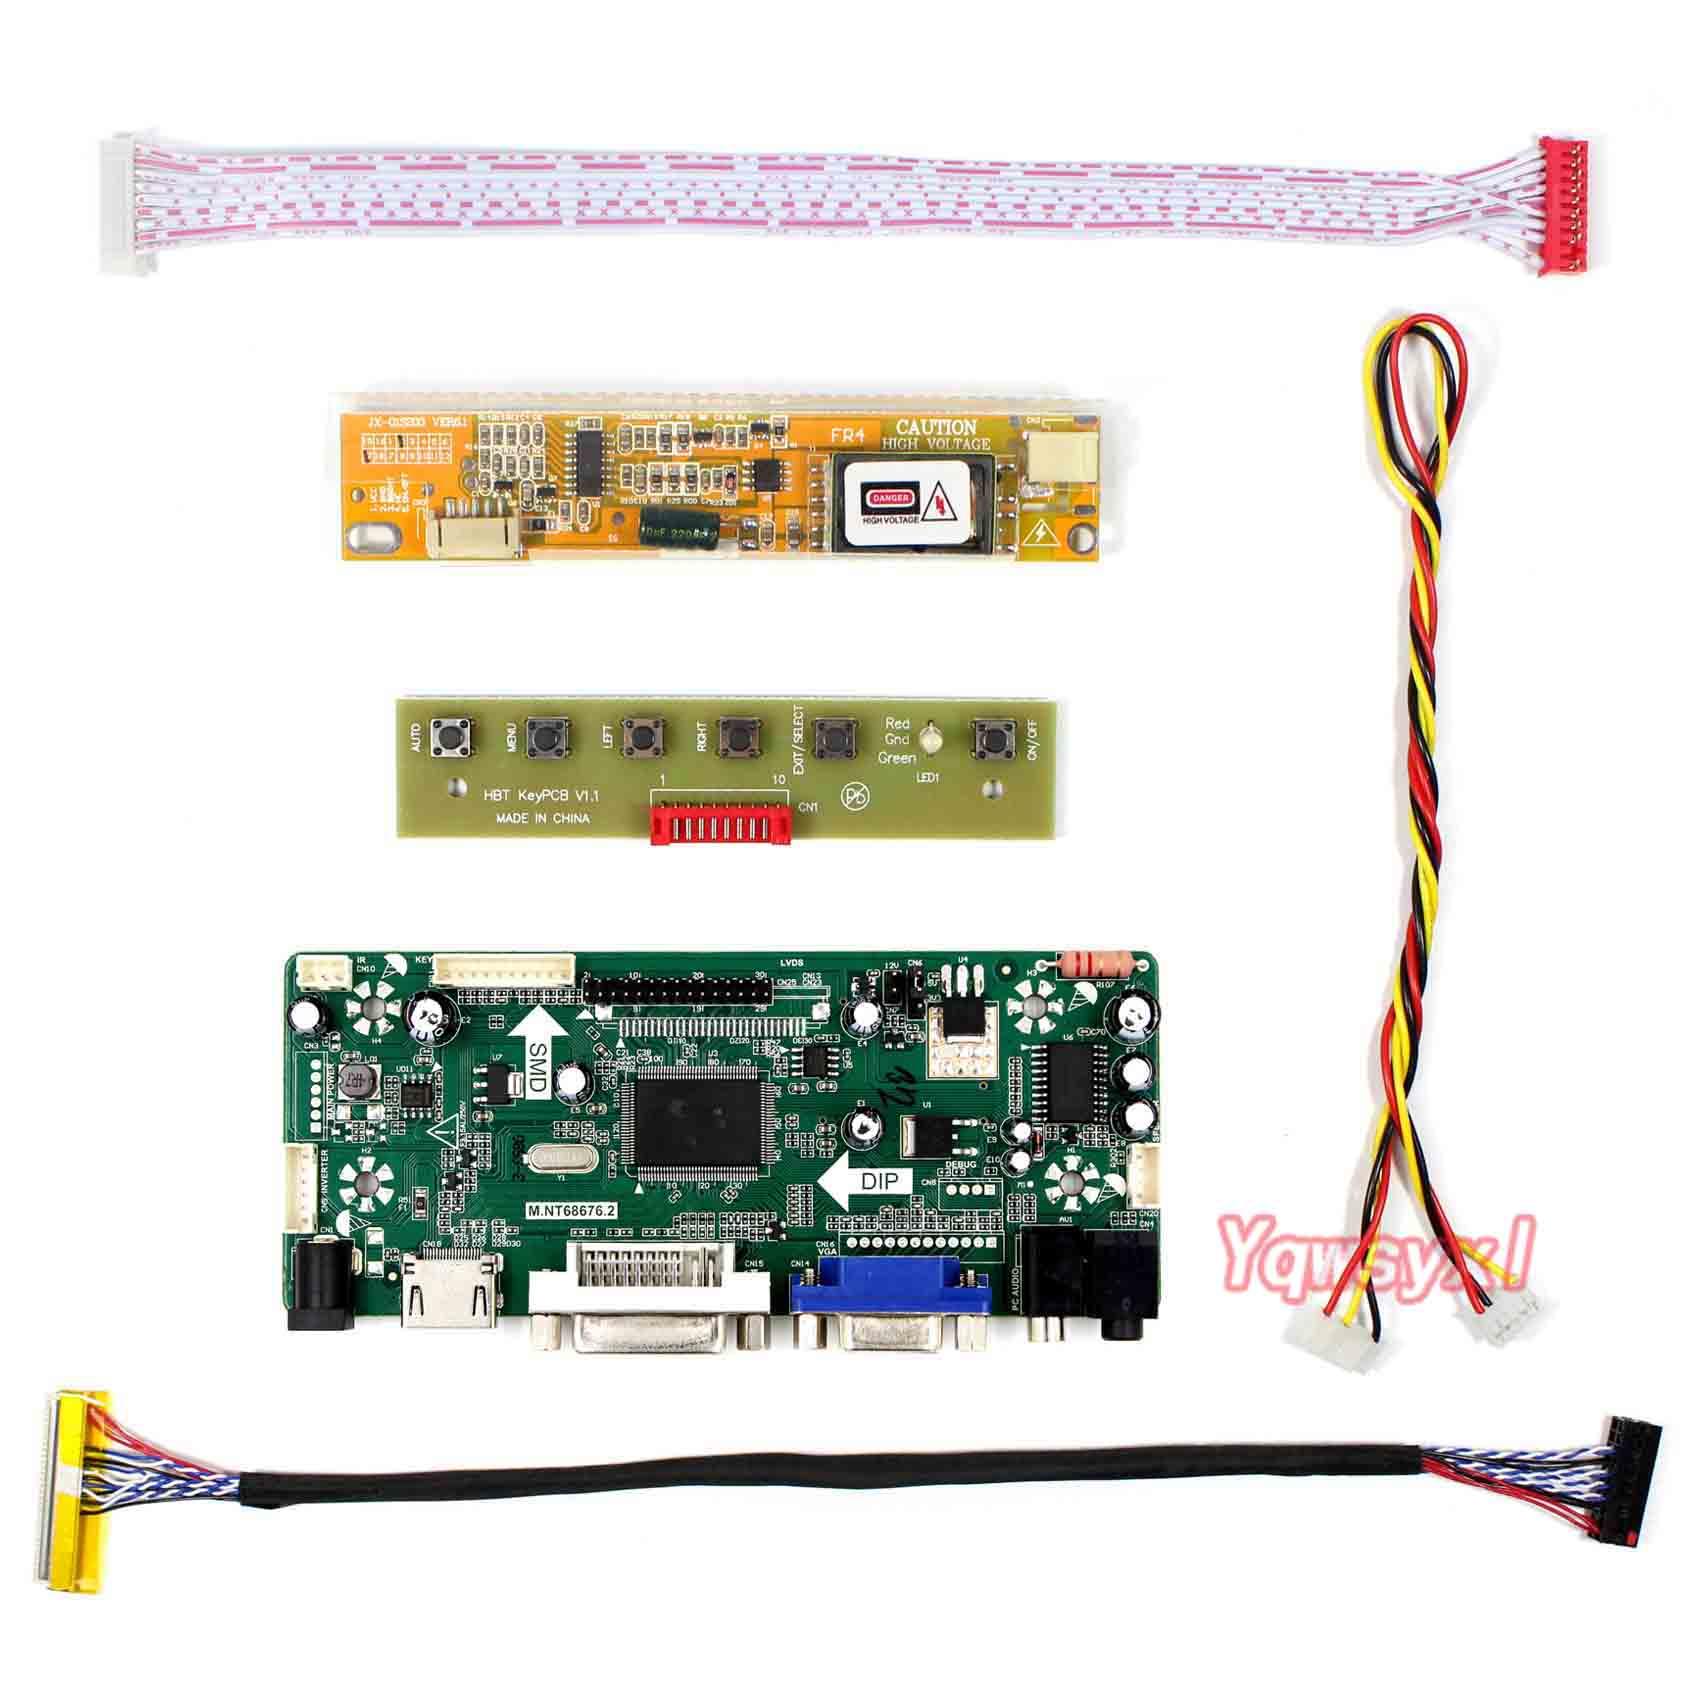 Yqwsyxl Control Board Monitor Kit For  LTN156AT01-D01  LTN156AT01-D02 HDMI + DVI + VGA LCD LED Screen Controller Board Driver